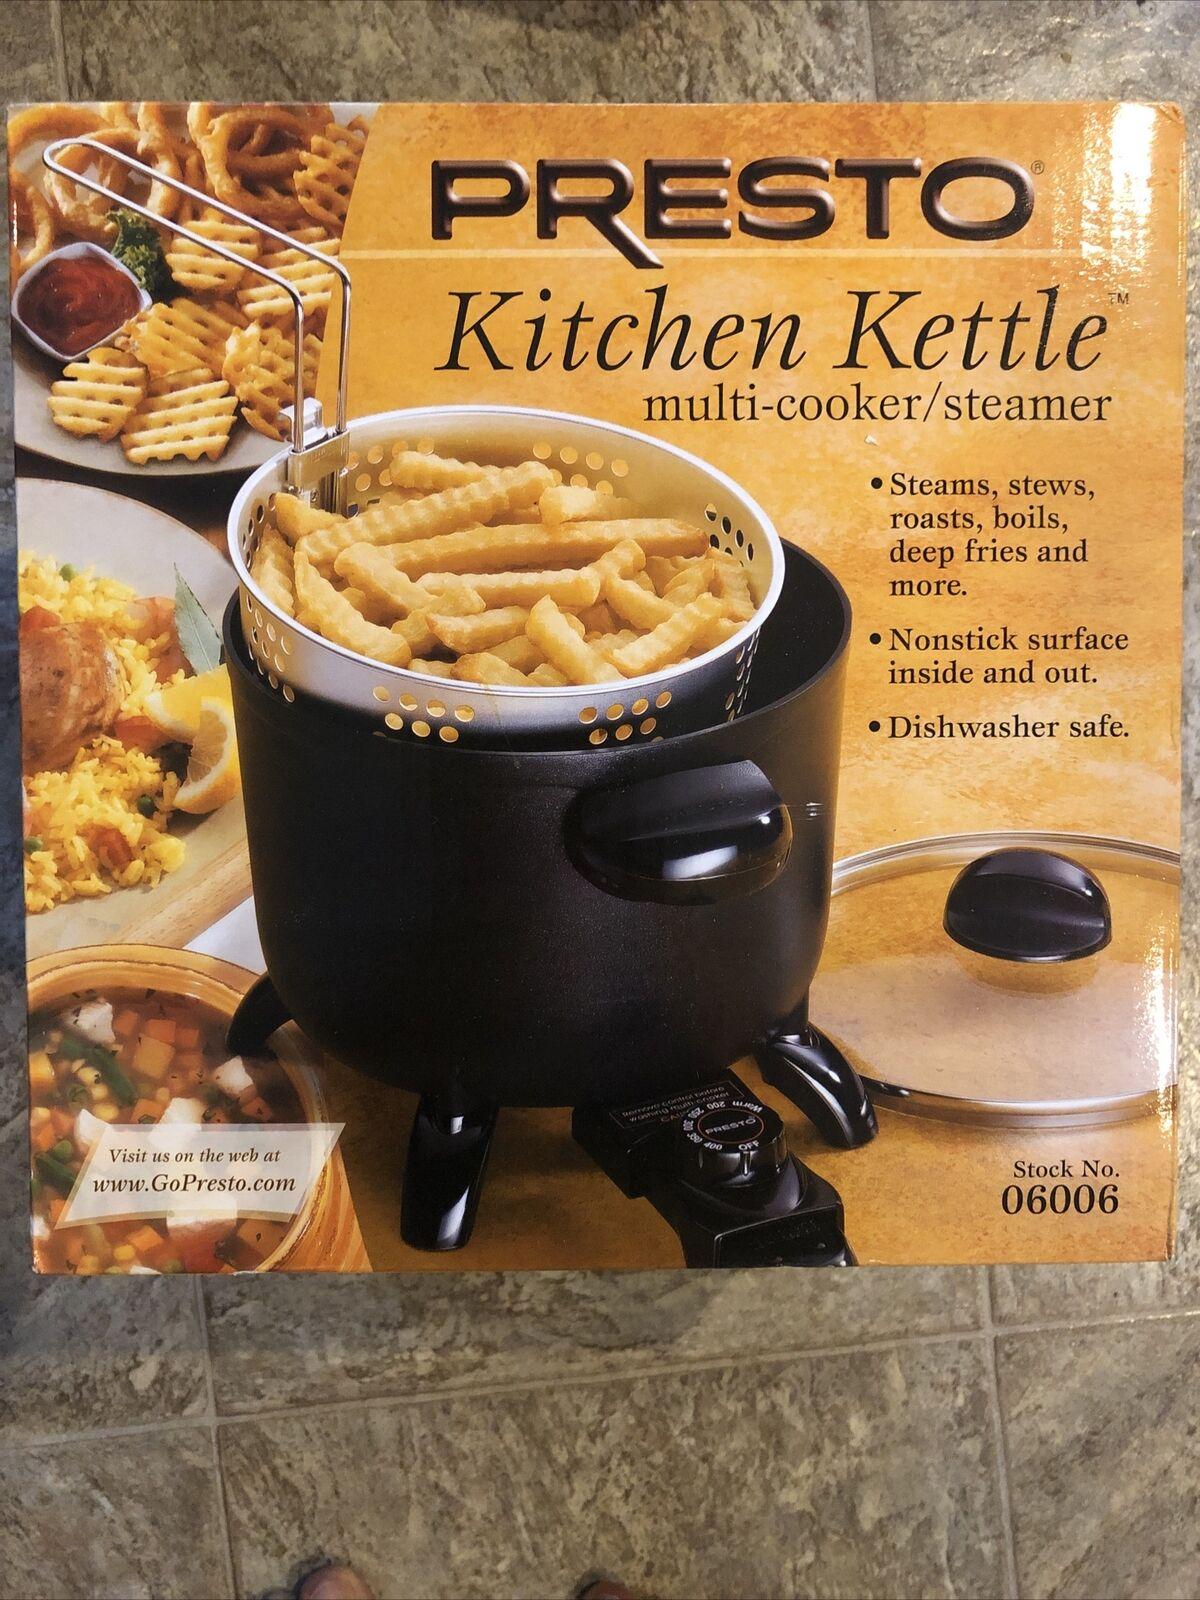 Presto 06006 Kitchen Kettle Multi Cooker Black For Sale Online Ebay